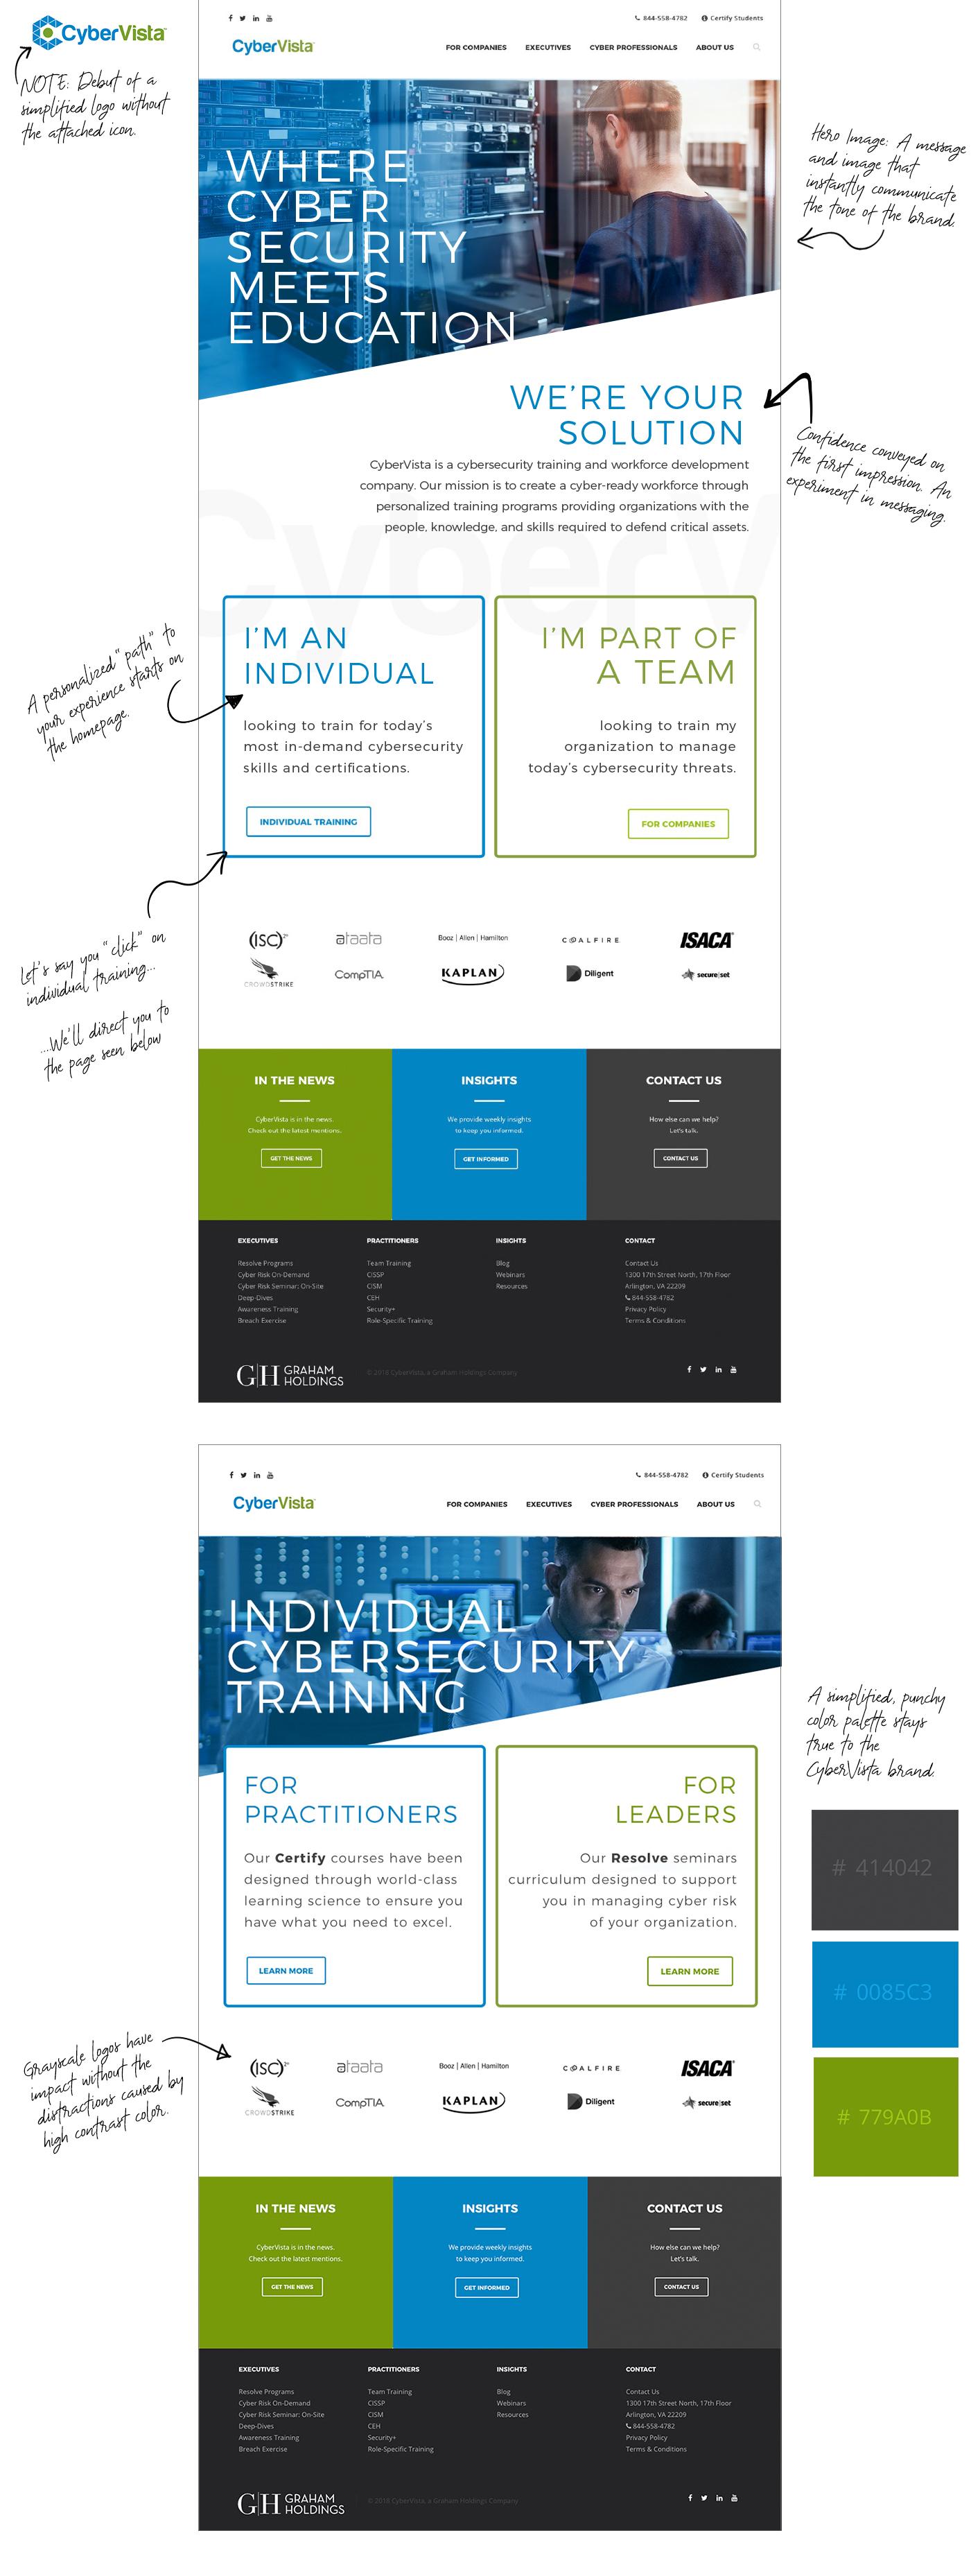 Website Experimental Design for Cybervista